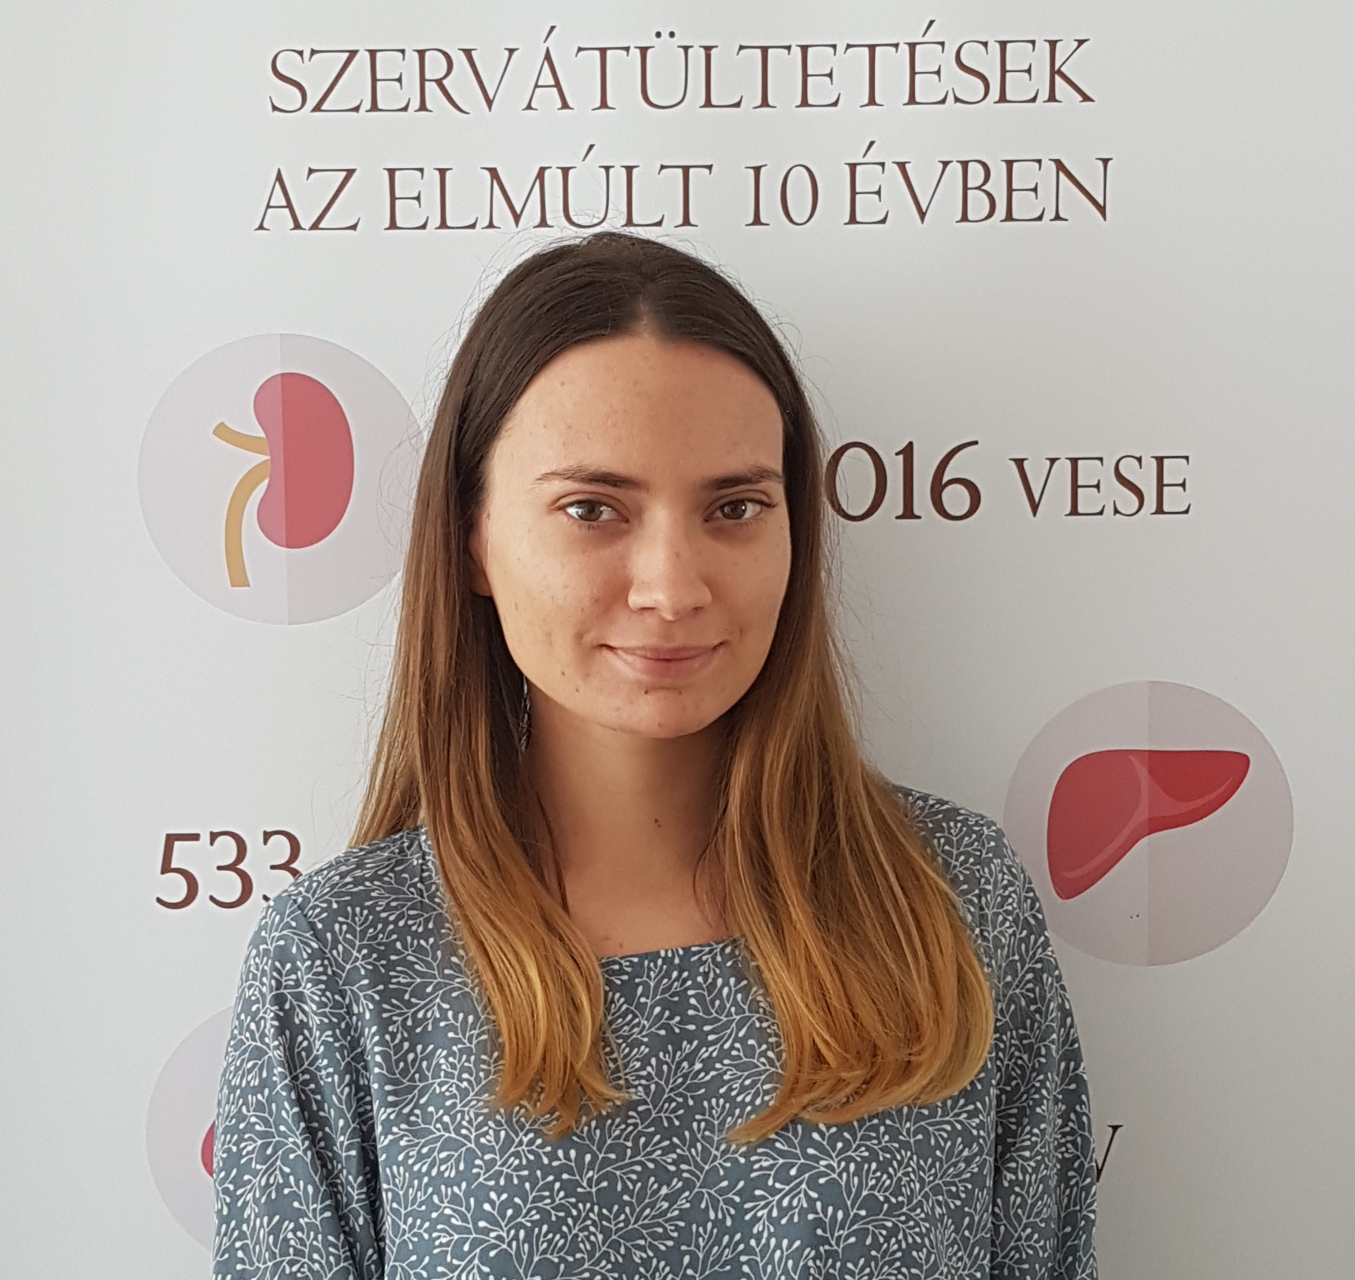 Varga Tamara